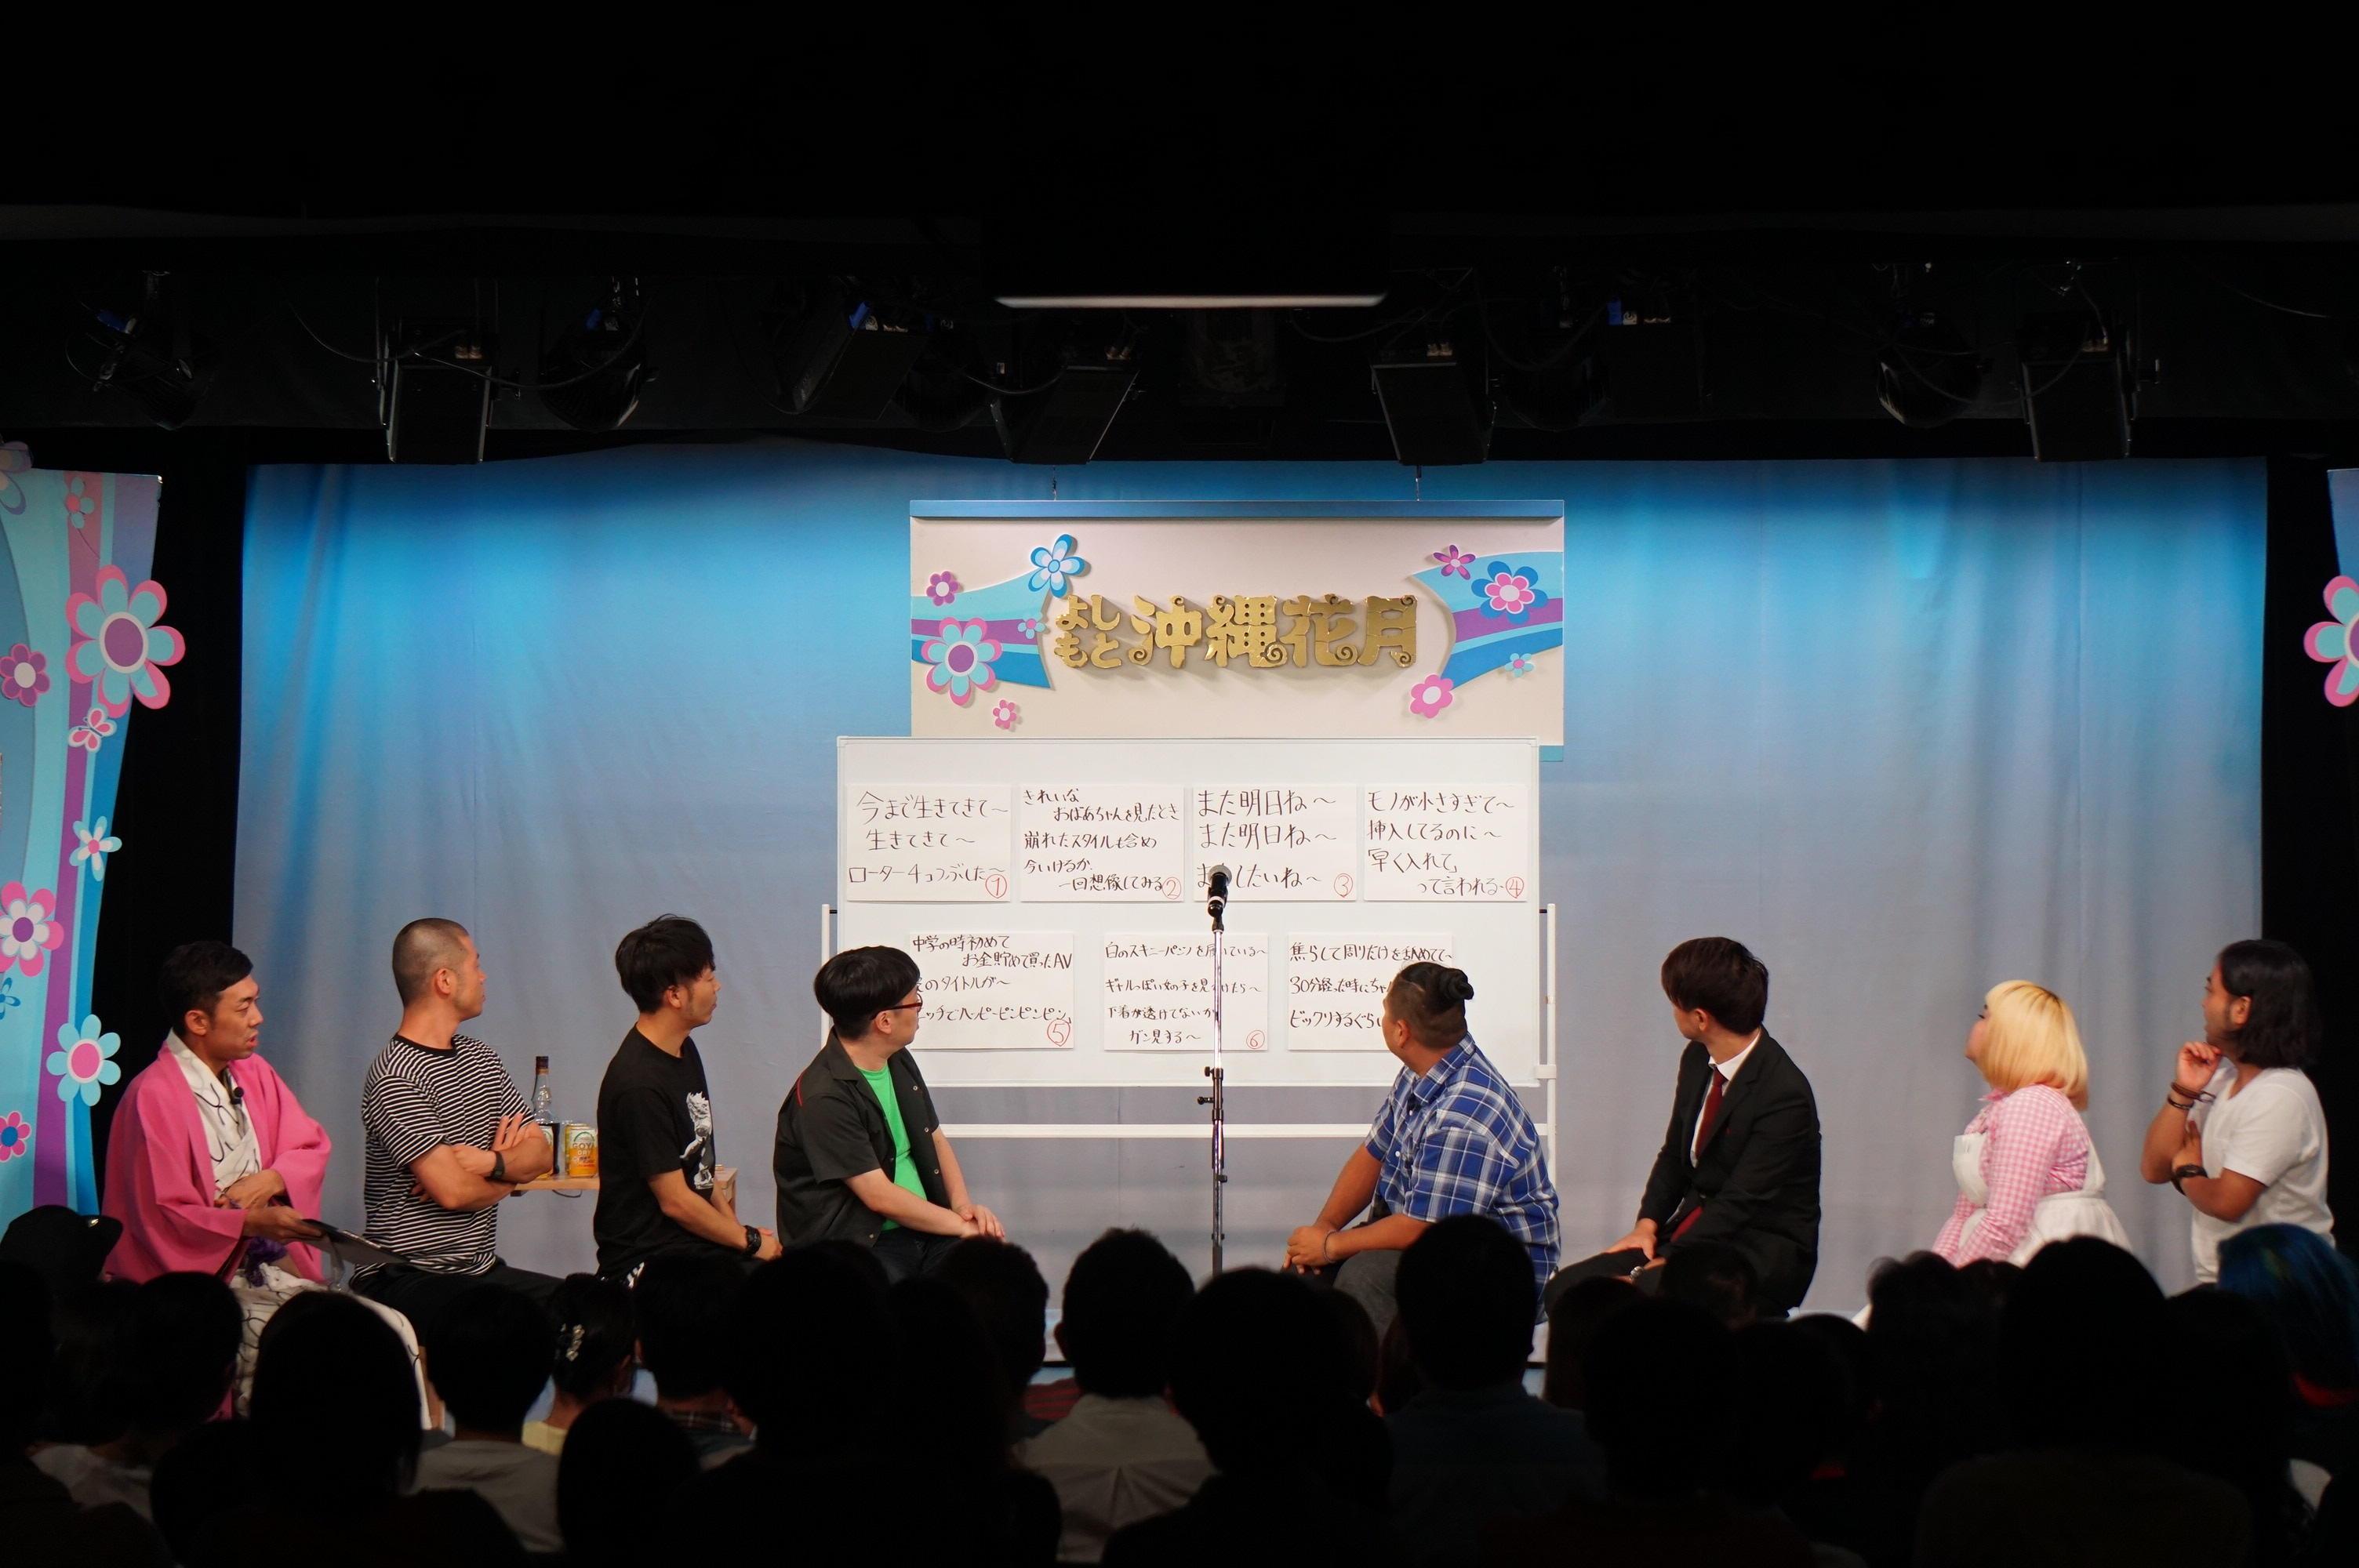 http://news.yoshimoto.co.jp/20161030181137-f82eefad0506a4bf380320927f8a6238695dcb20.jpg